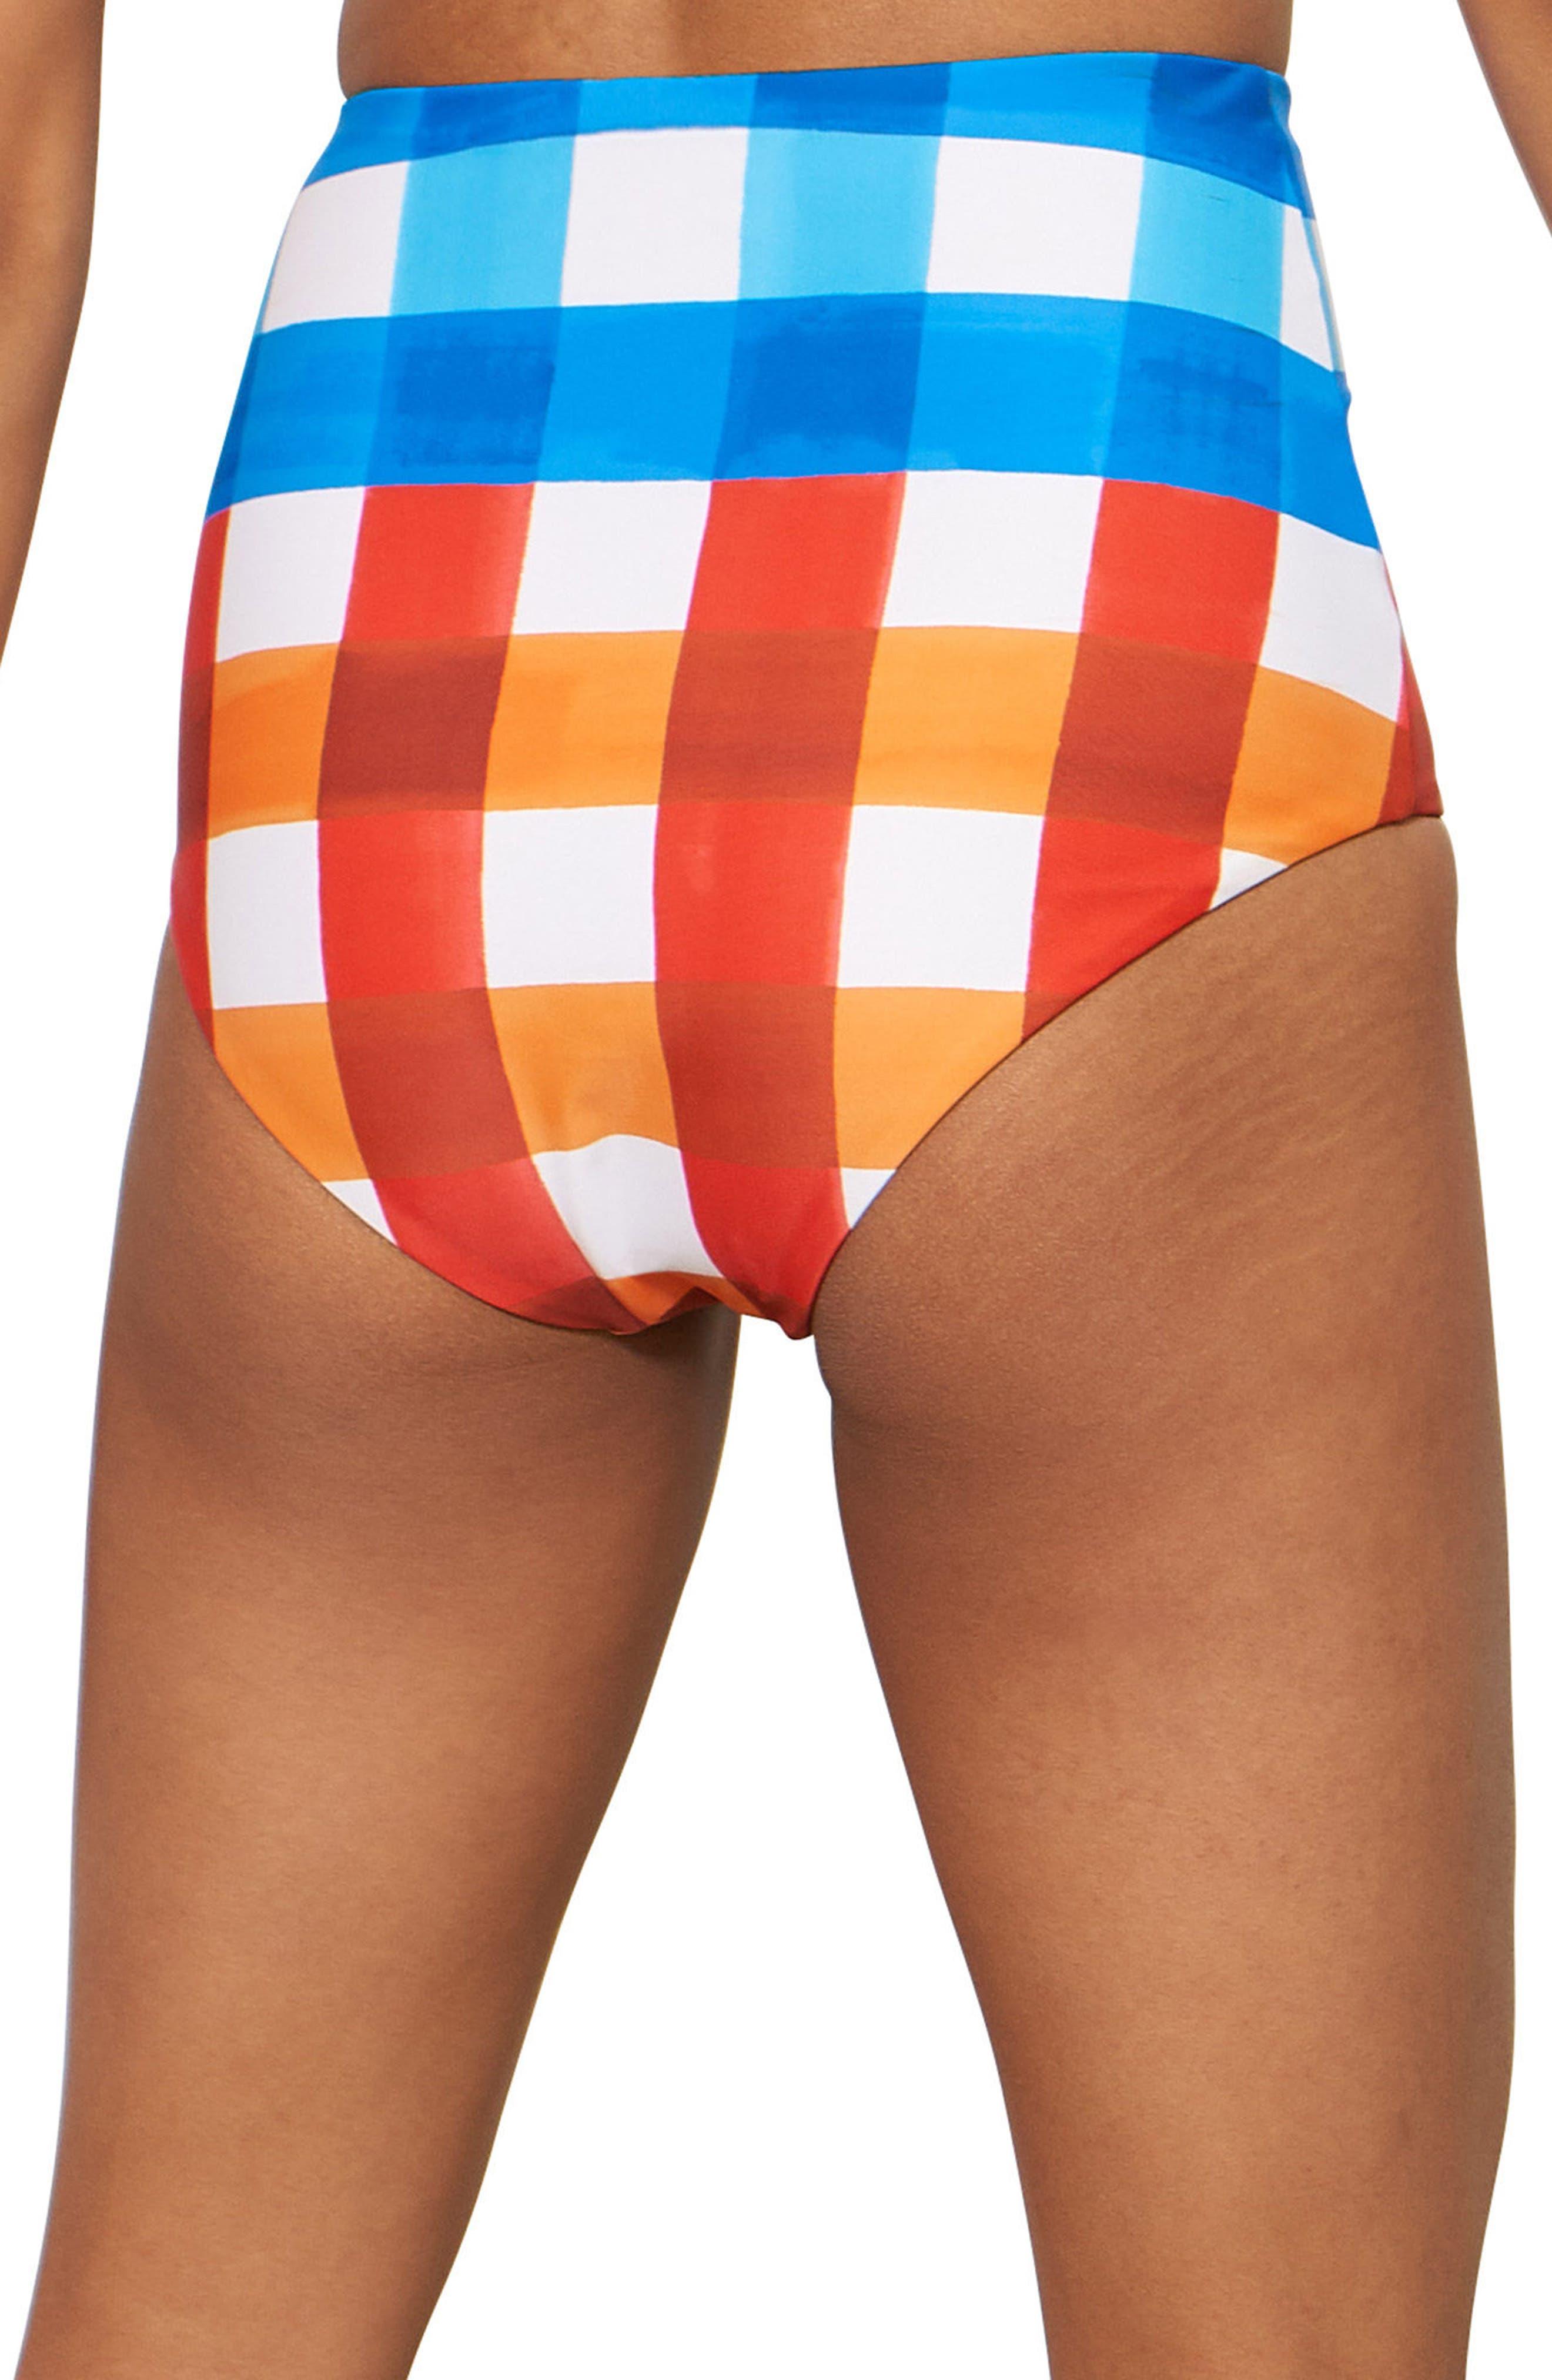 Lydia High Waist Bikini Bottoms,                             Alternate thumbnail 2, color,                             RED/ BLUE MULTI